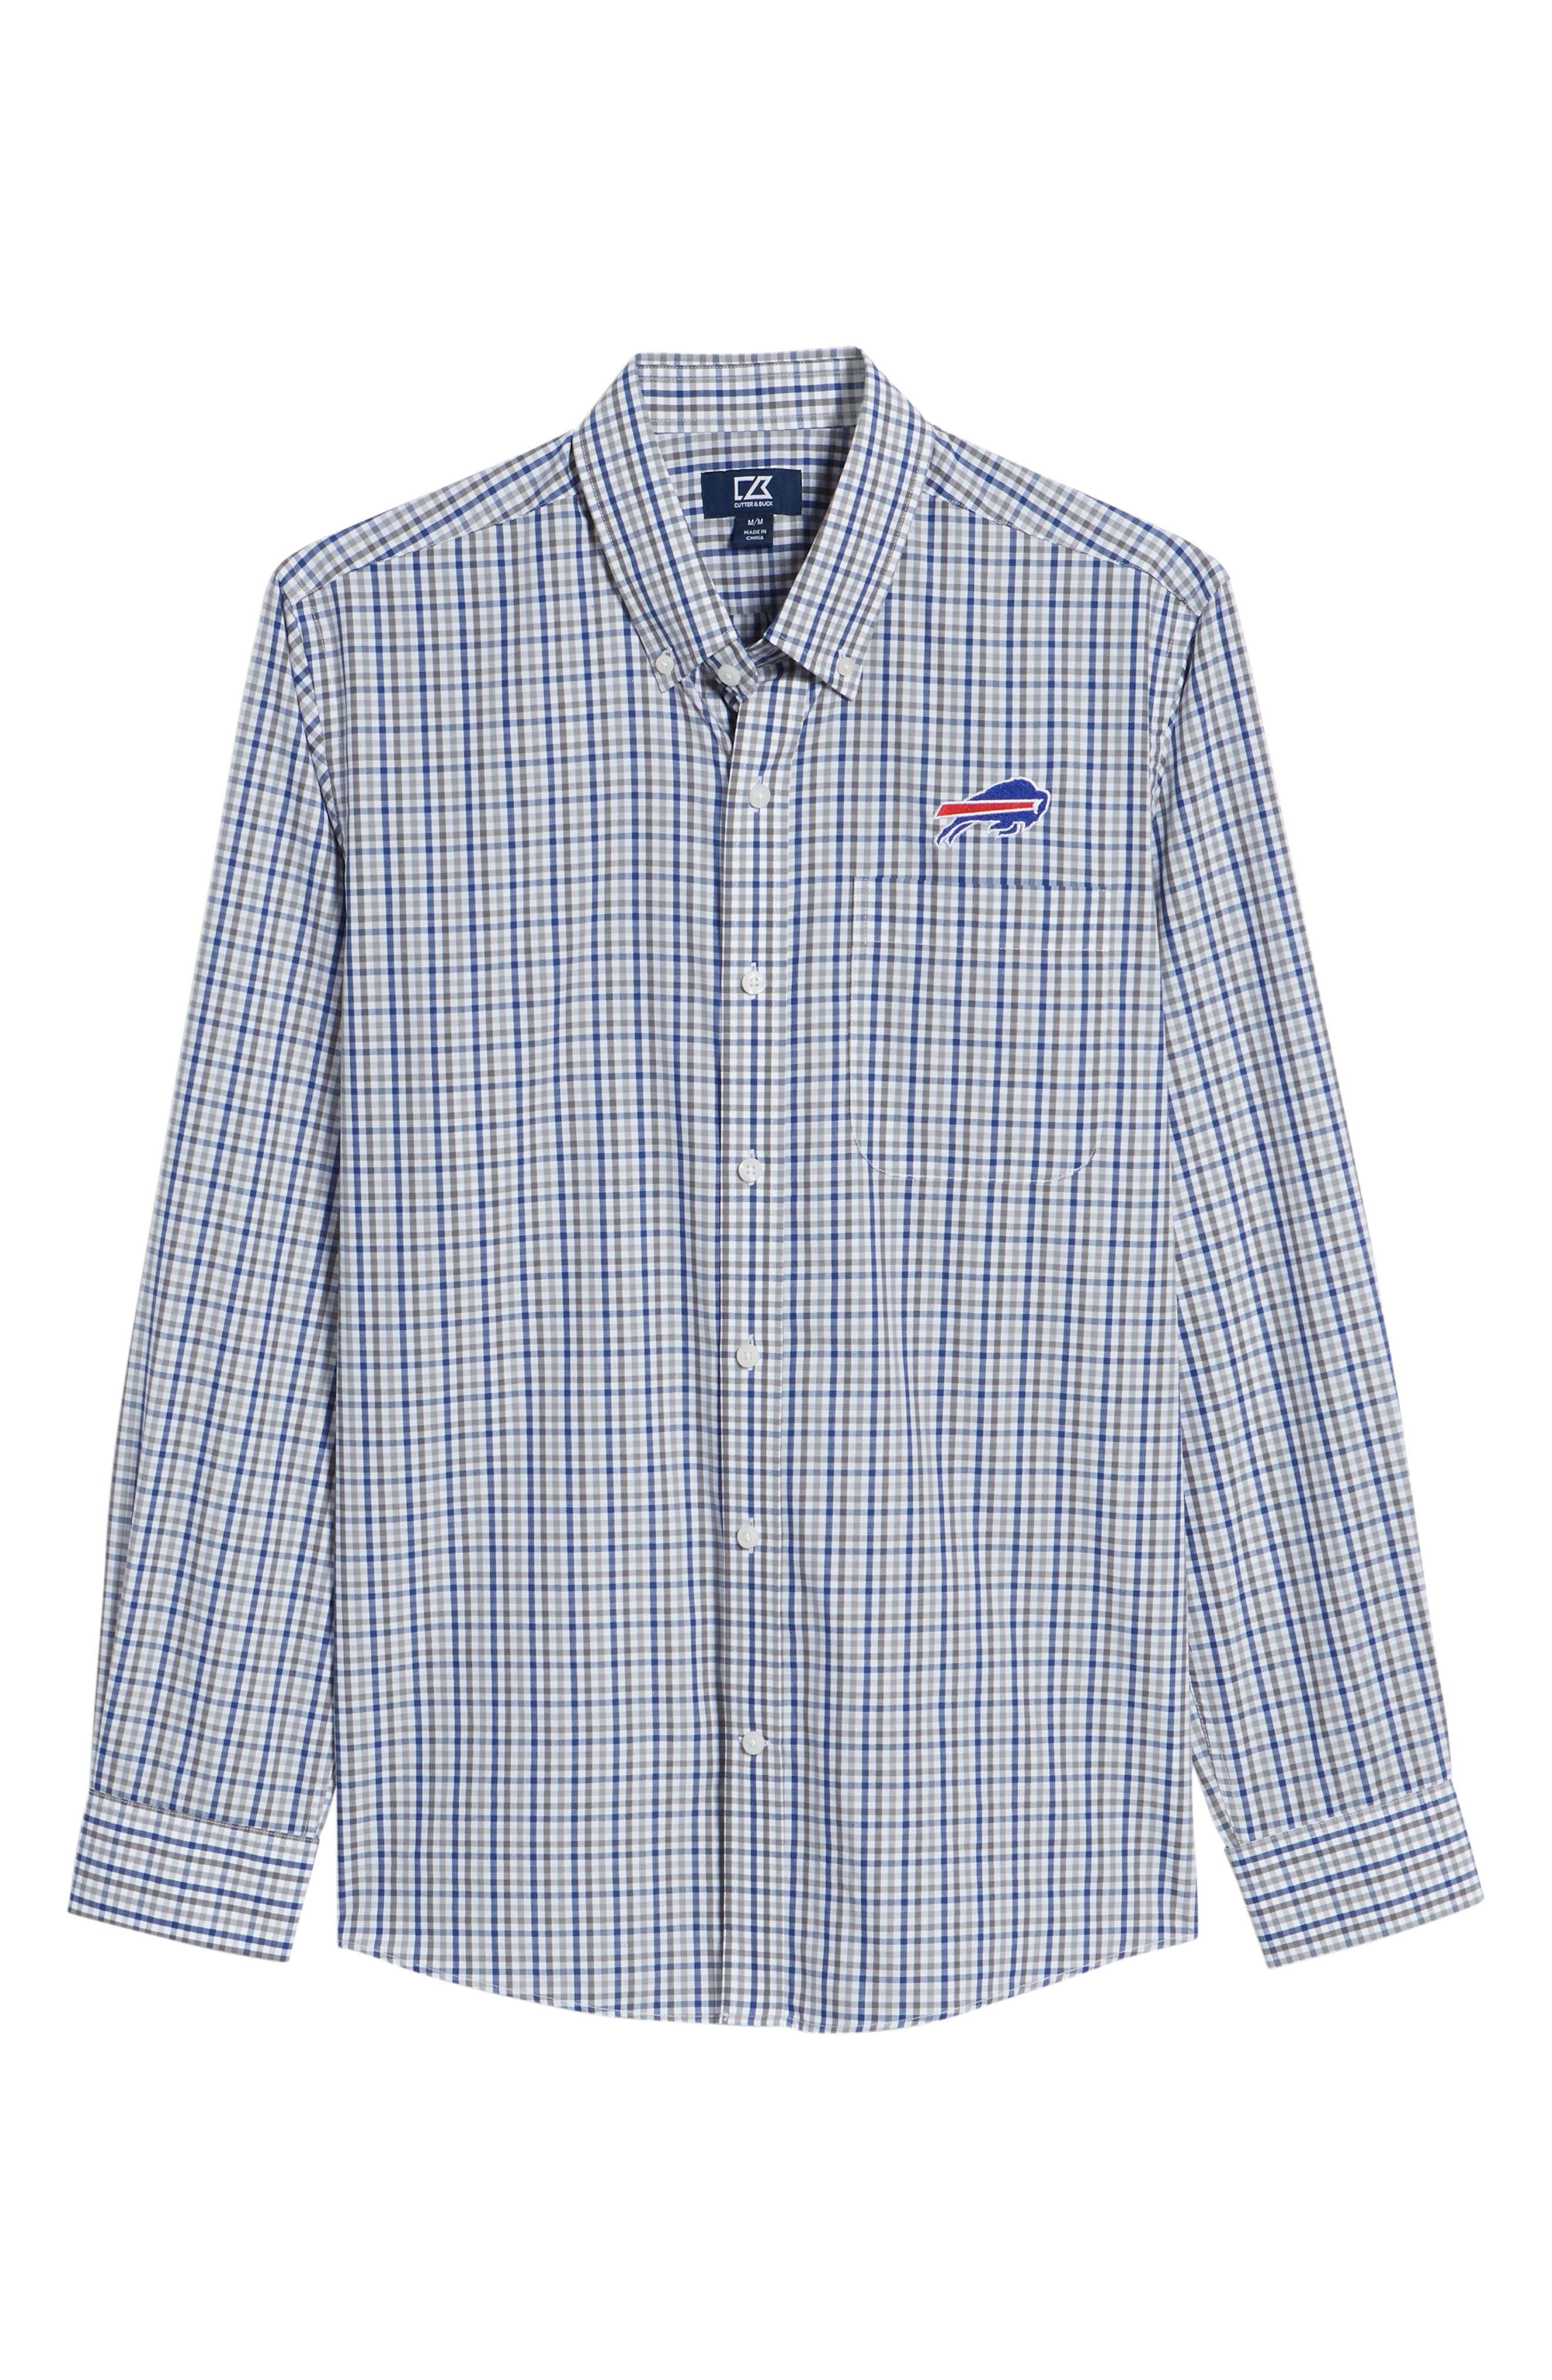 Buffalo Bills - Gilman Regular Fit Plaid Sport Shirt,                             Alternate thumbnail 6, color,                             TOUR BLUE